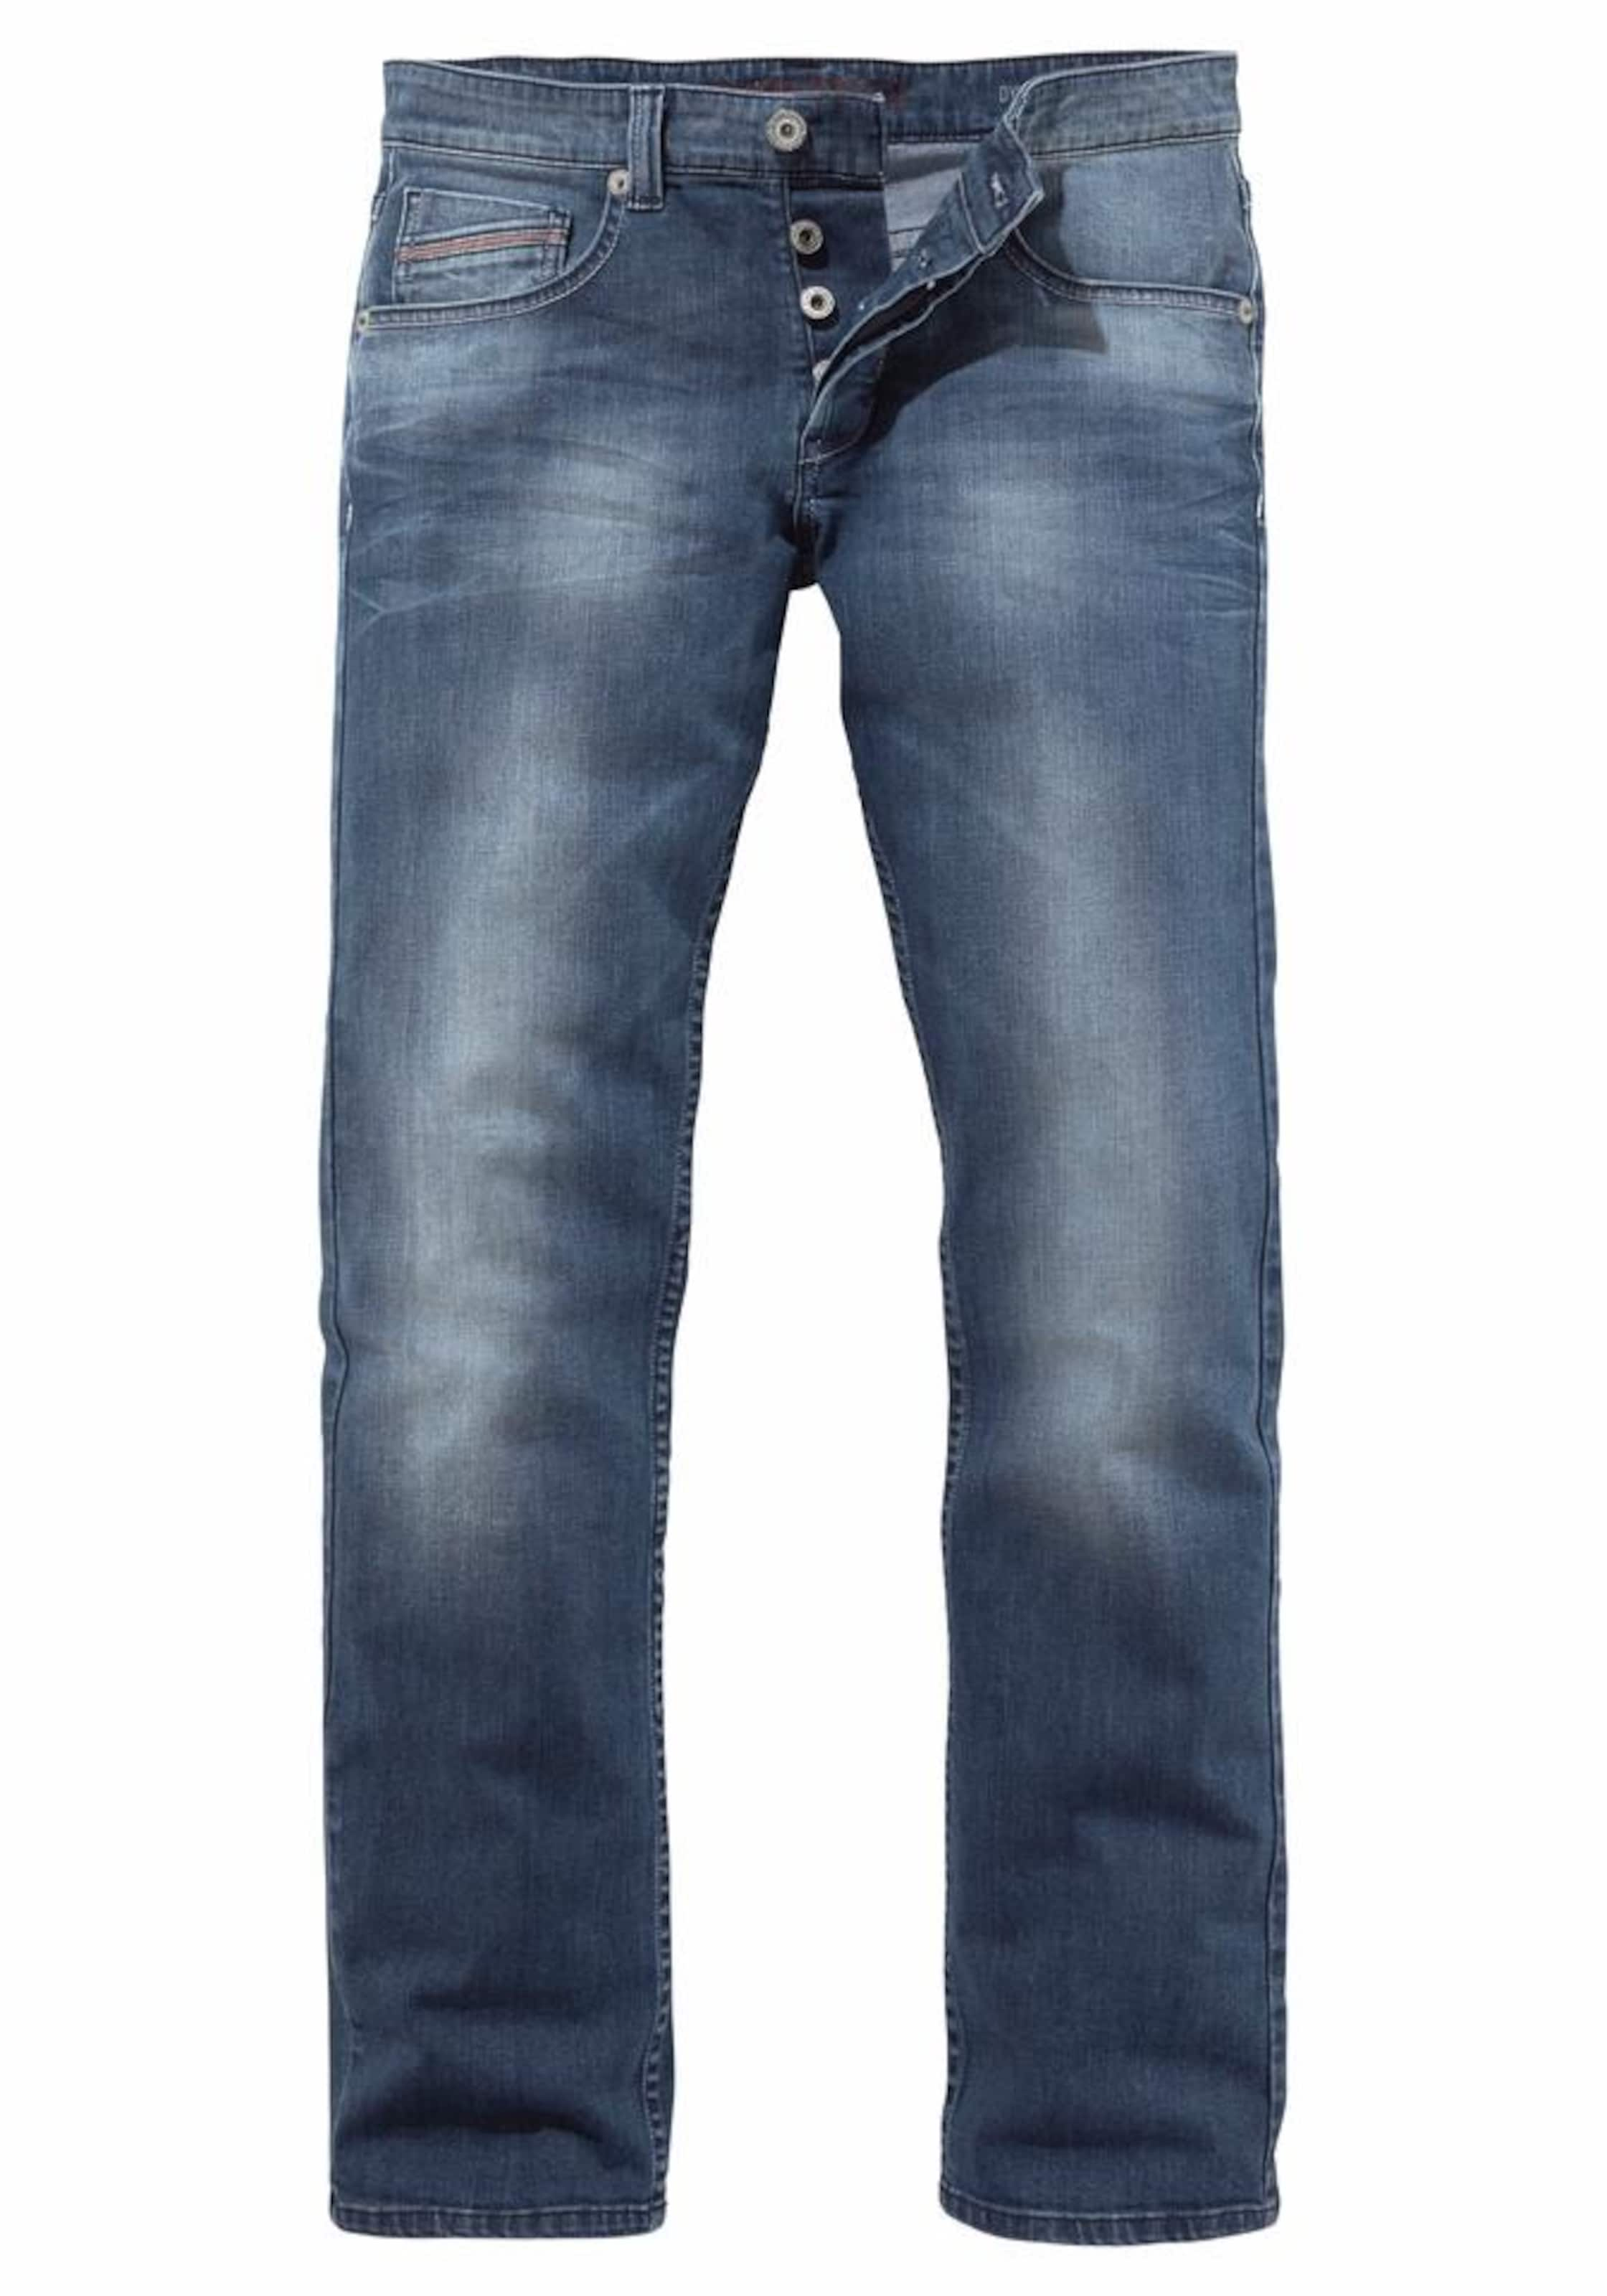 Bruno Banani In Blue Jeans Denim trdCxshQ